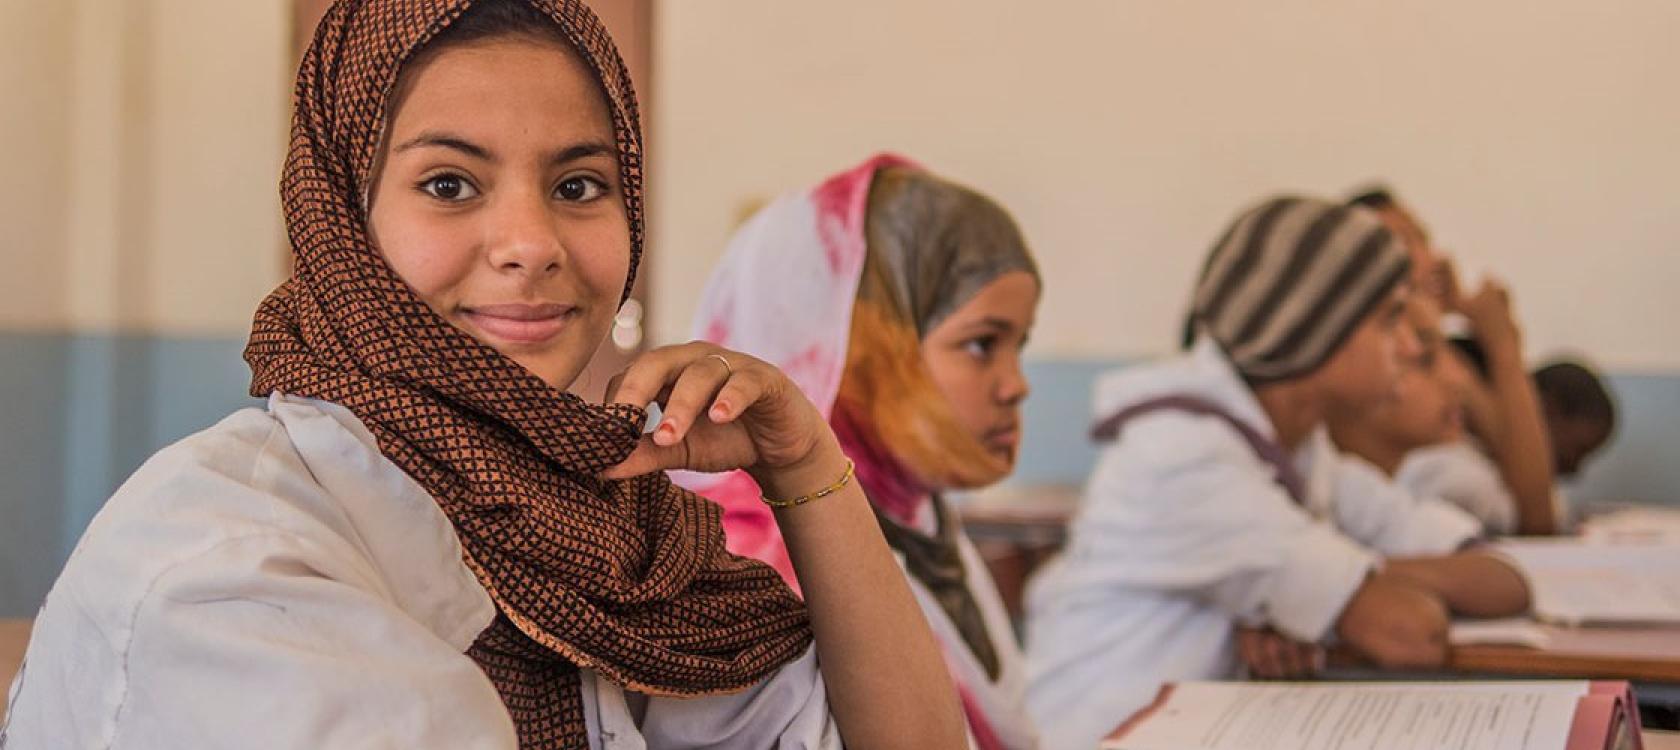 Mauritania, Students of the Arafatt high school, Nouakchott